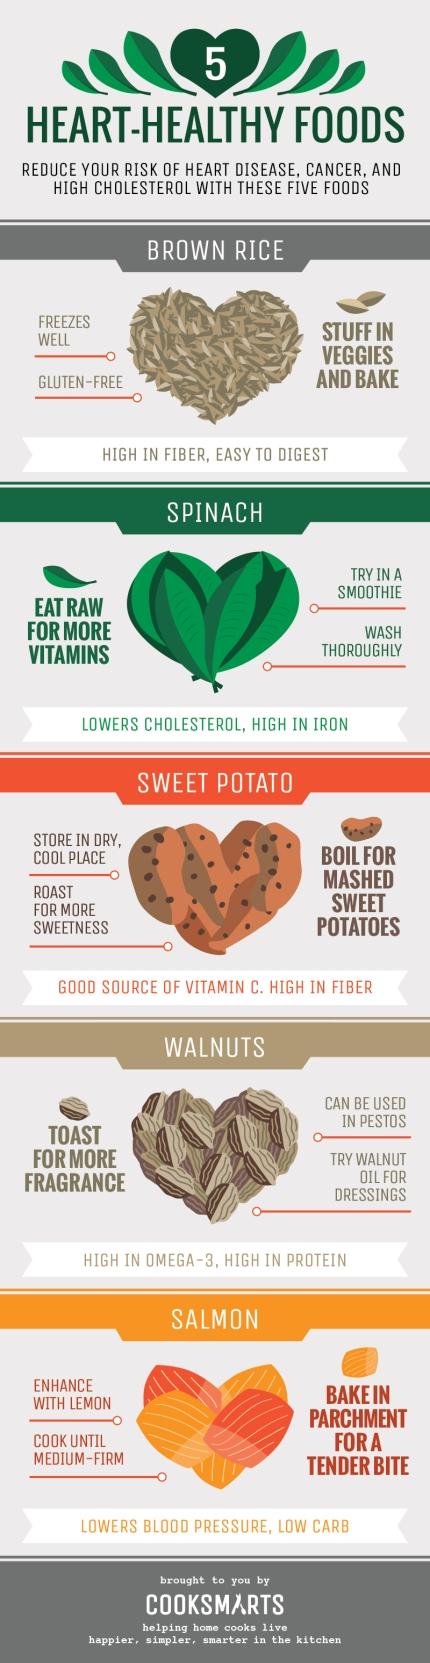 5-heart-healthy-foods_537bba3039eb9